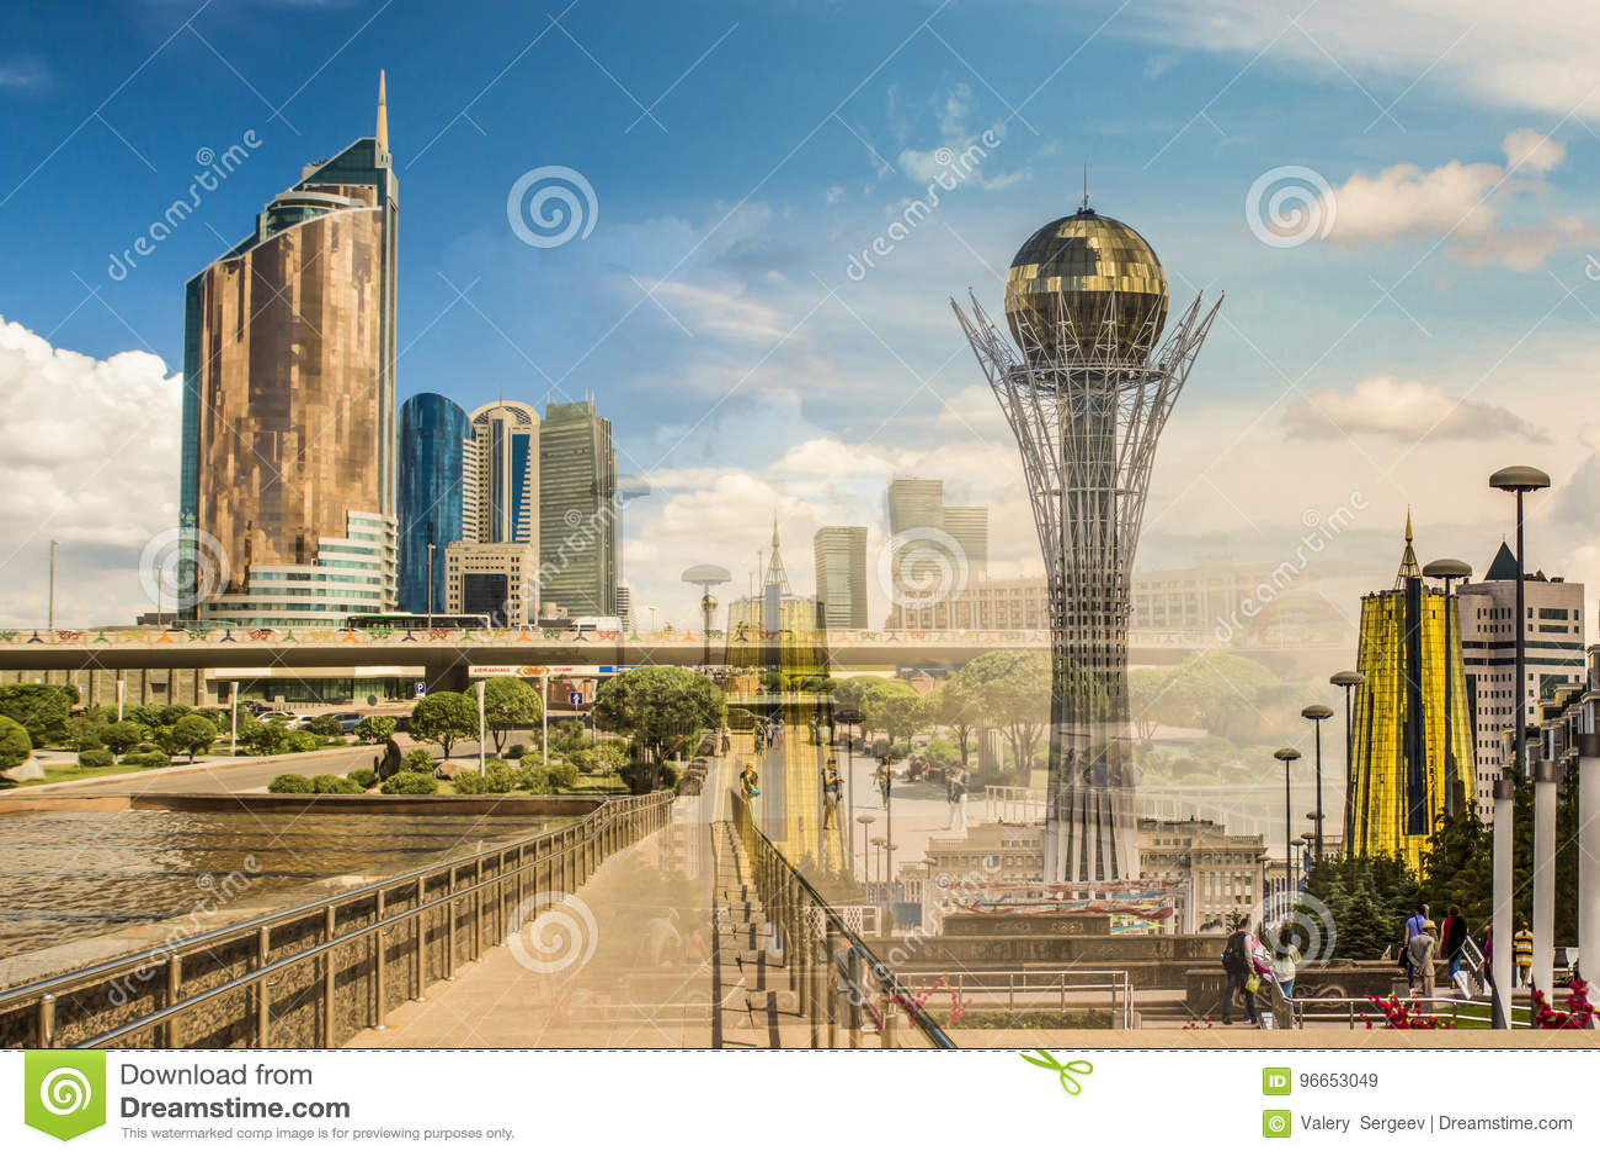 Kazakhstan astana Nurzhol Boulevard collage